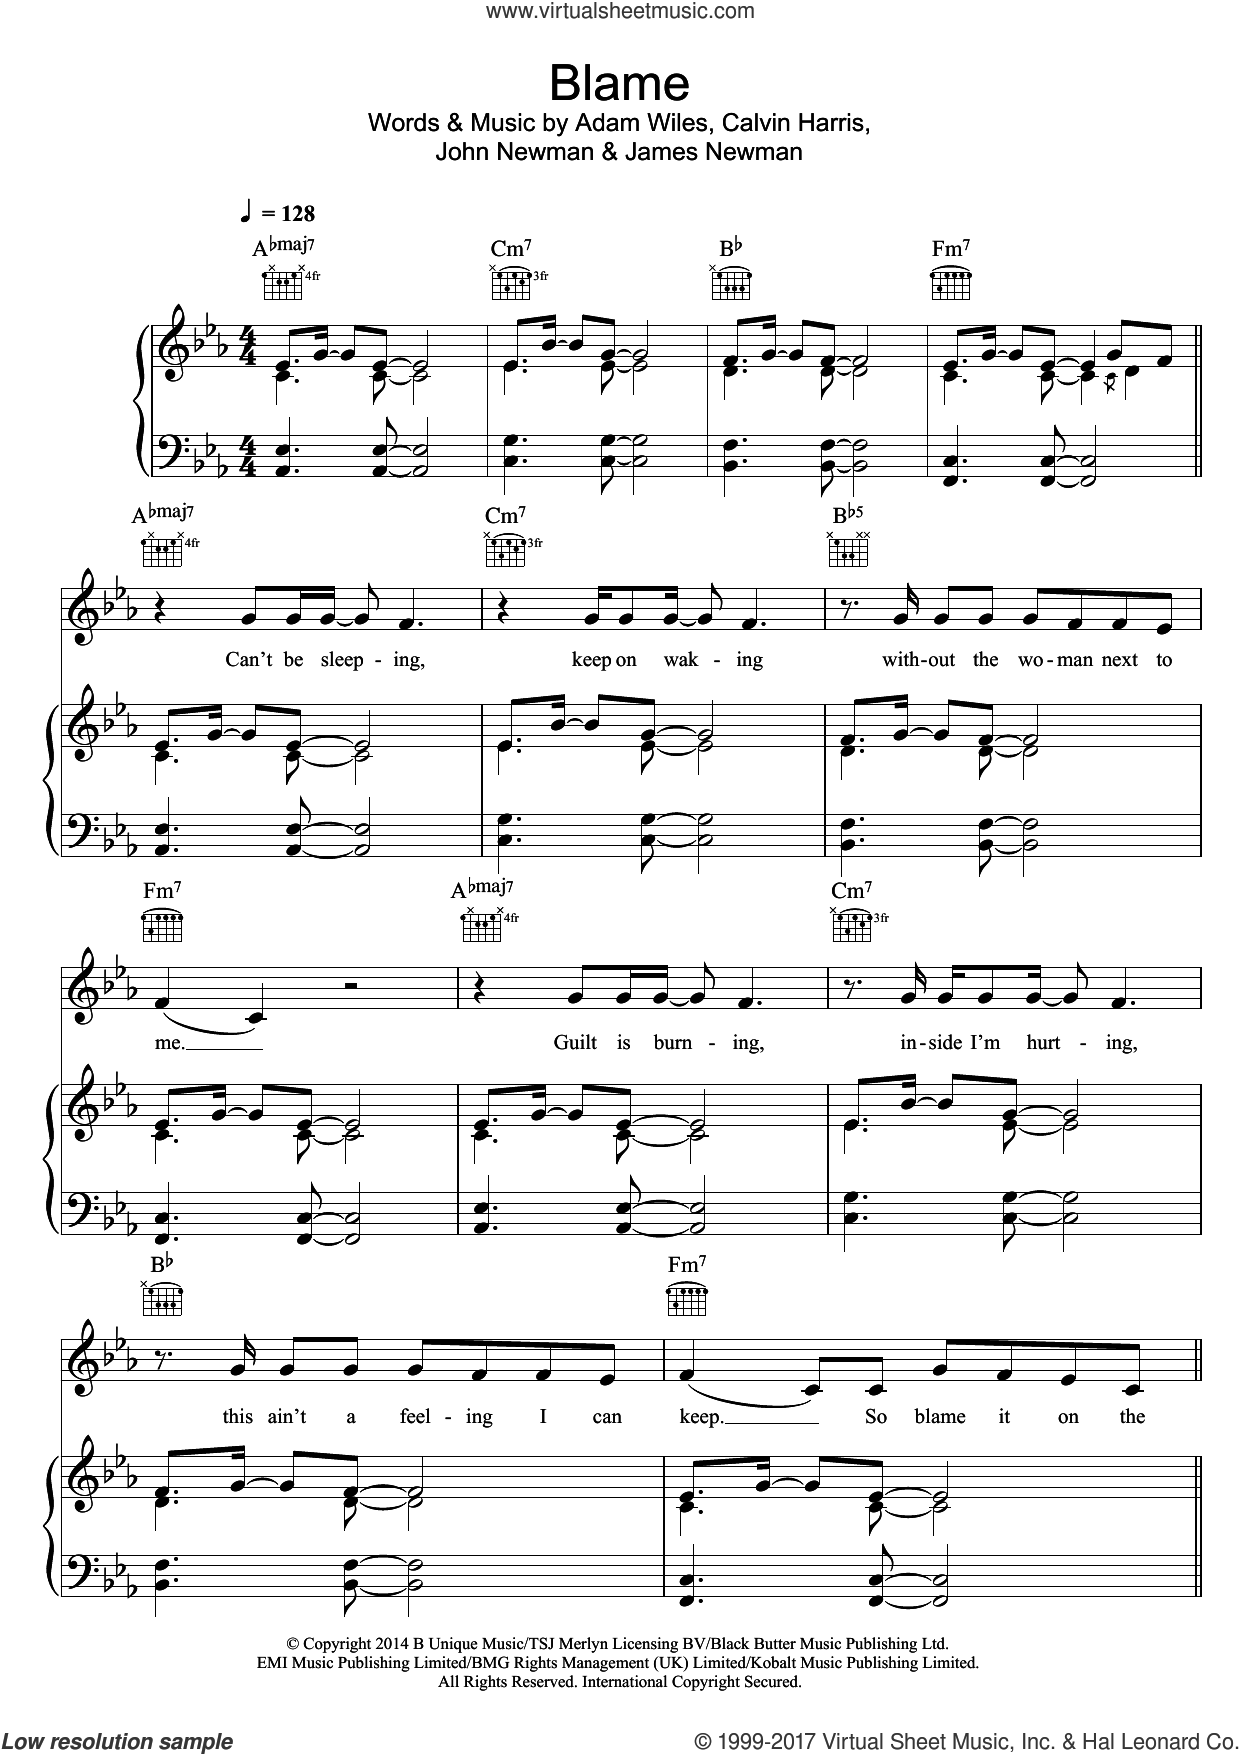 Blame (feat. John Newman) sheet music for voice, piano or guitar by Calvin Harris, Adam Wiles, James Newman and John Newman, intermediate skill level